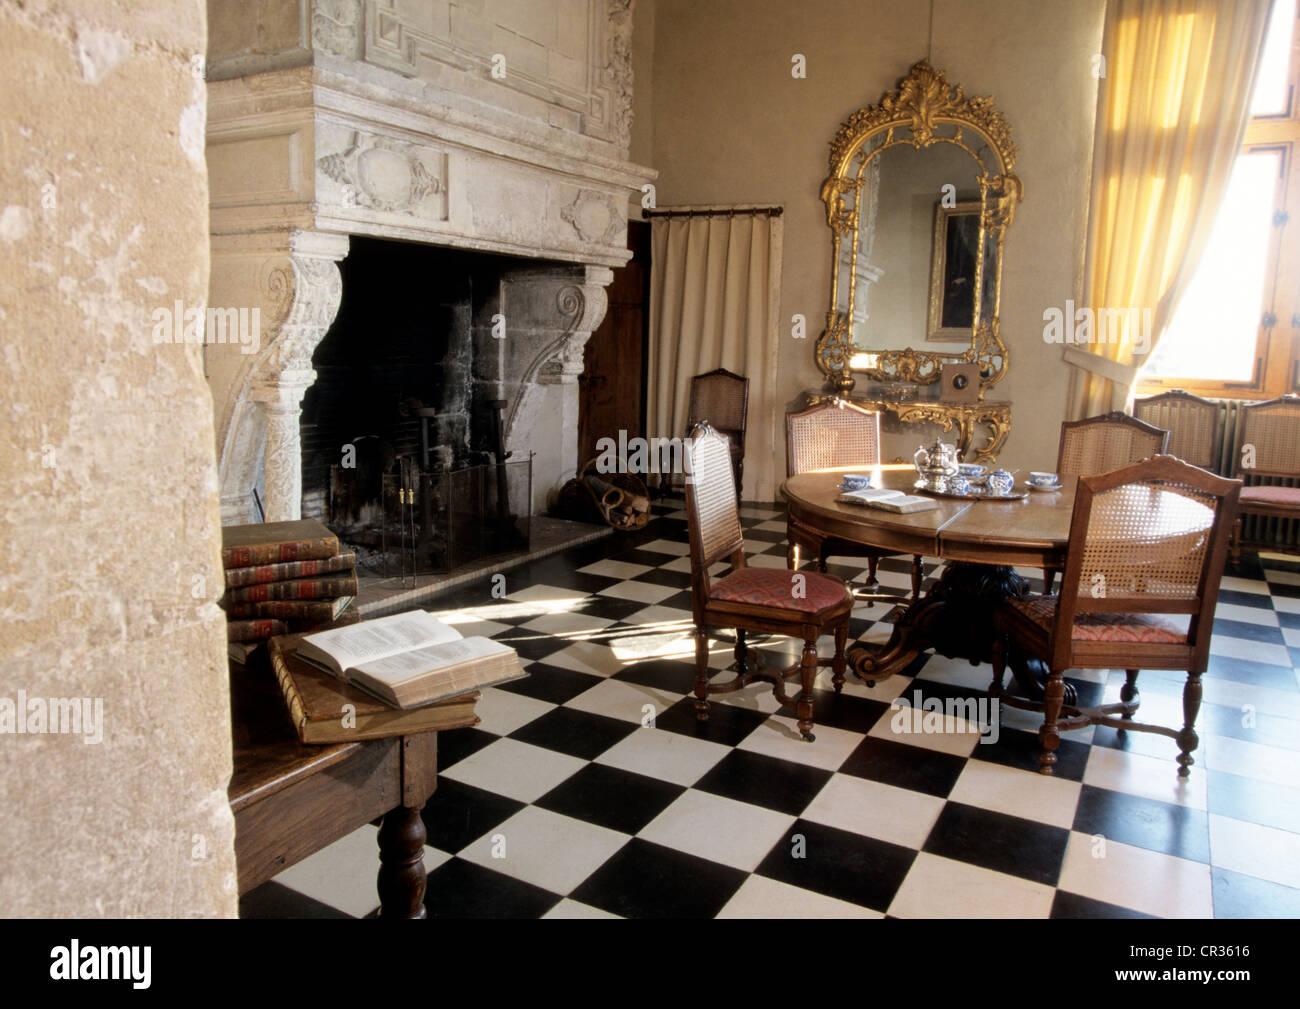 france indre et loire touraine region of the french. Black Bedroom Furniture Sets. Home Design Ideas